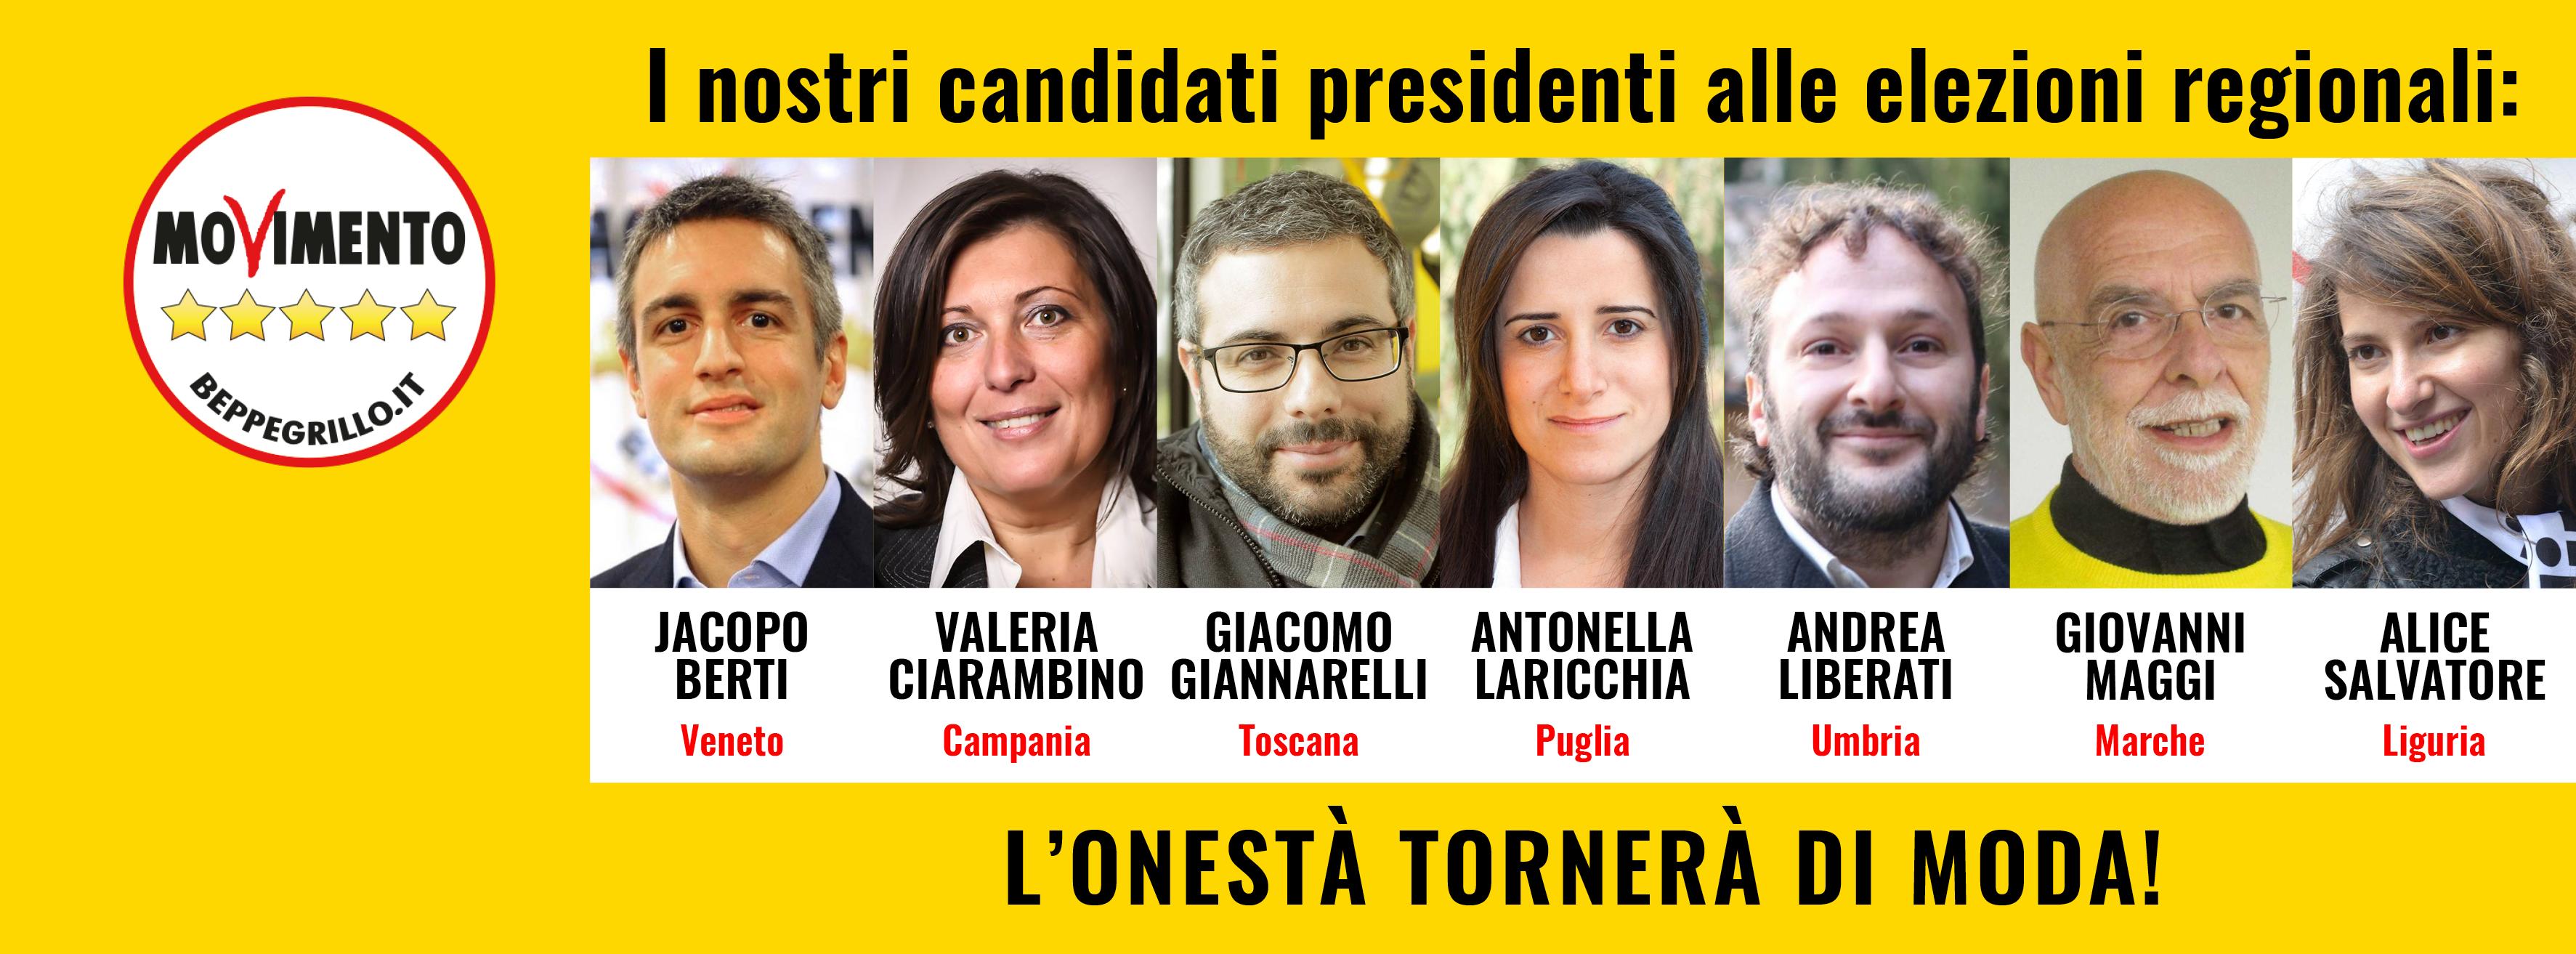 candidati-regionali_motto-4